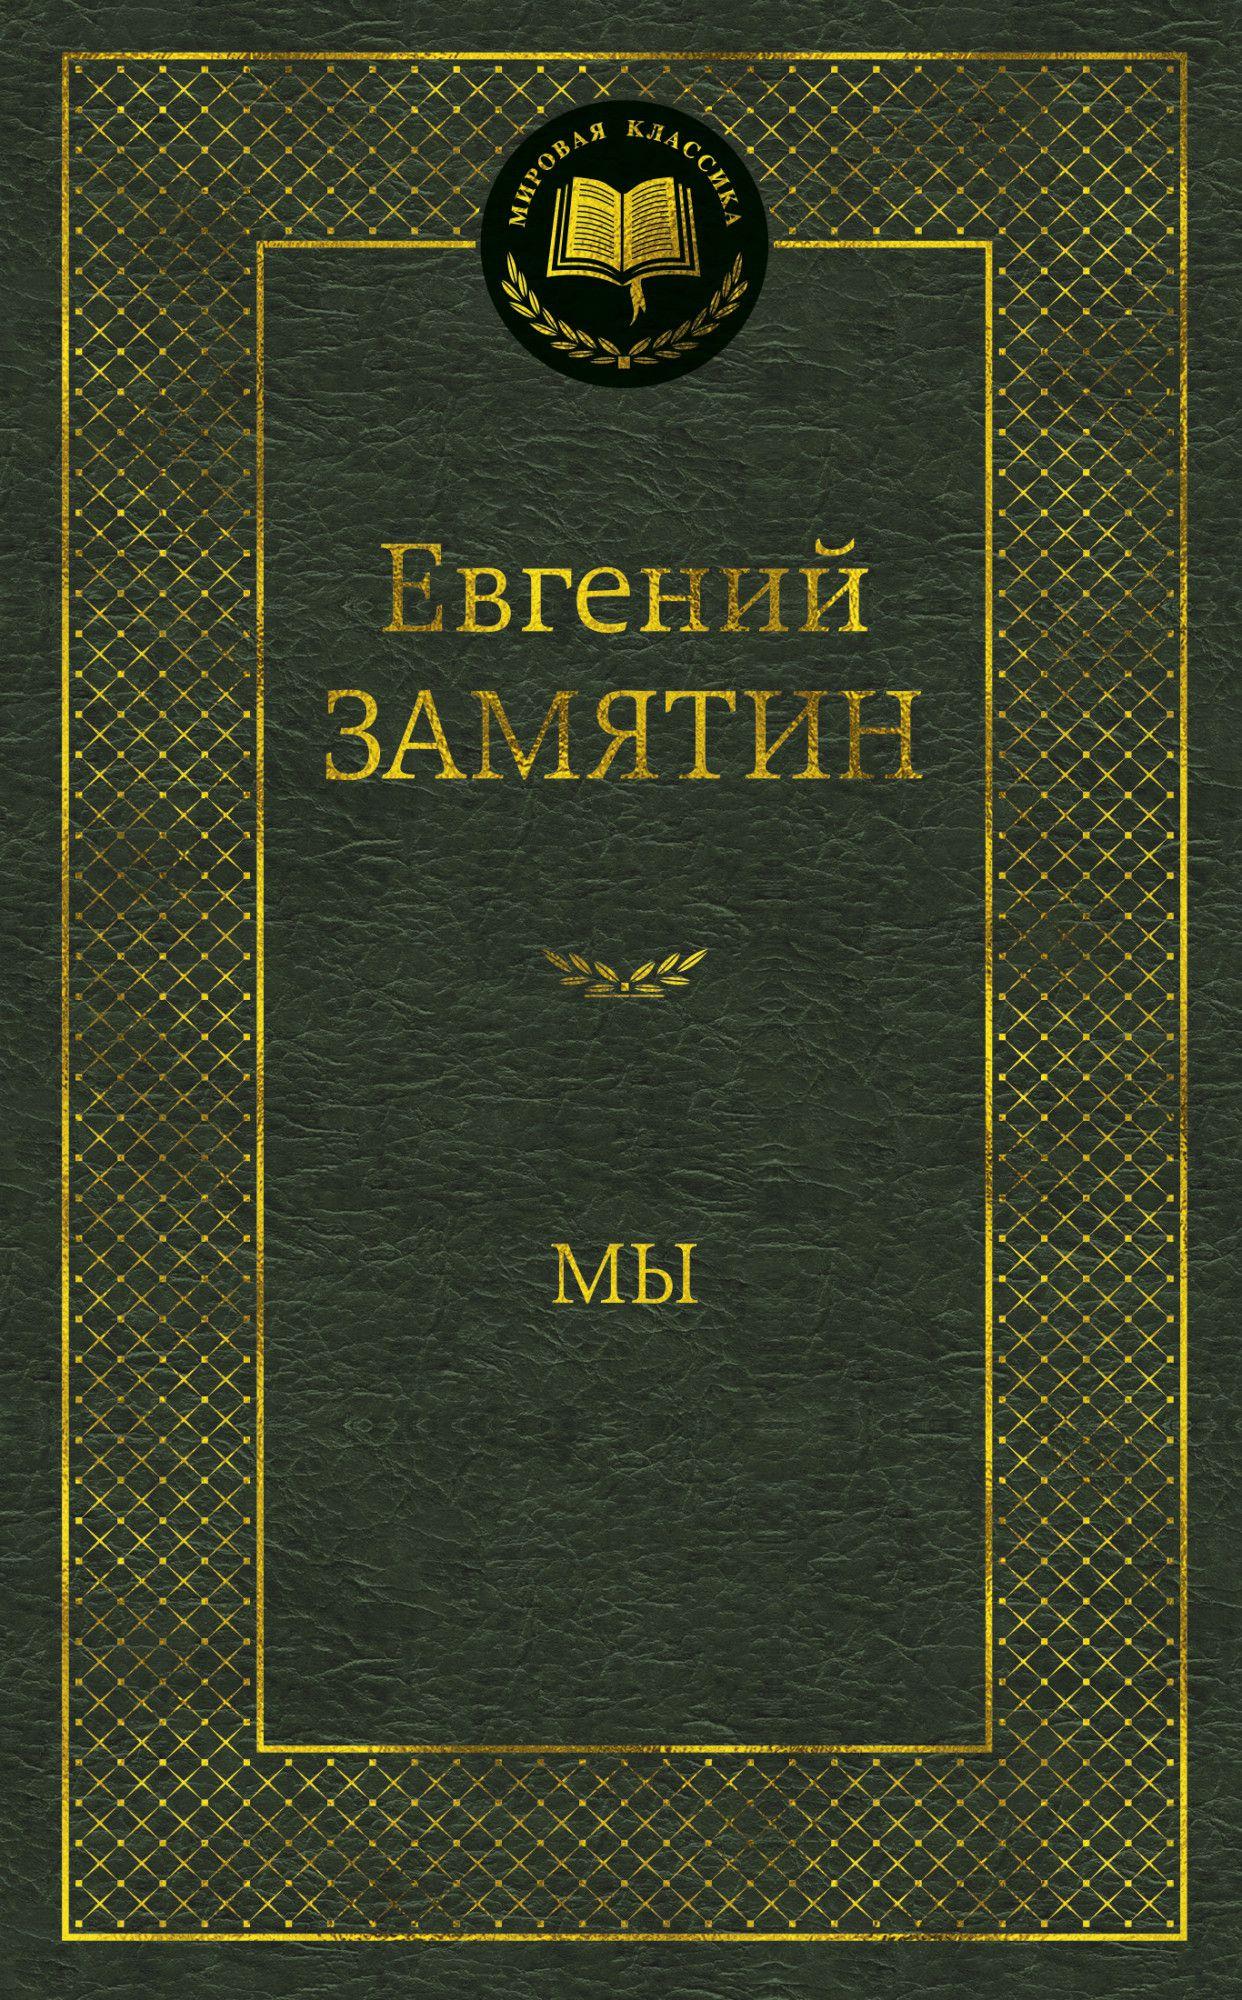 Замятин Евгений Замятин: Мы